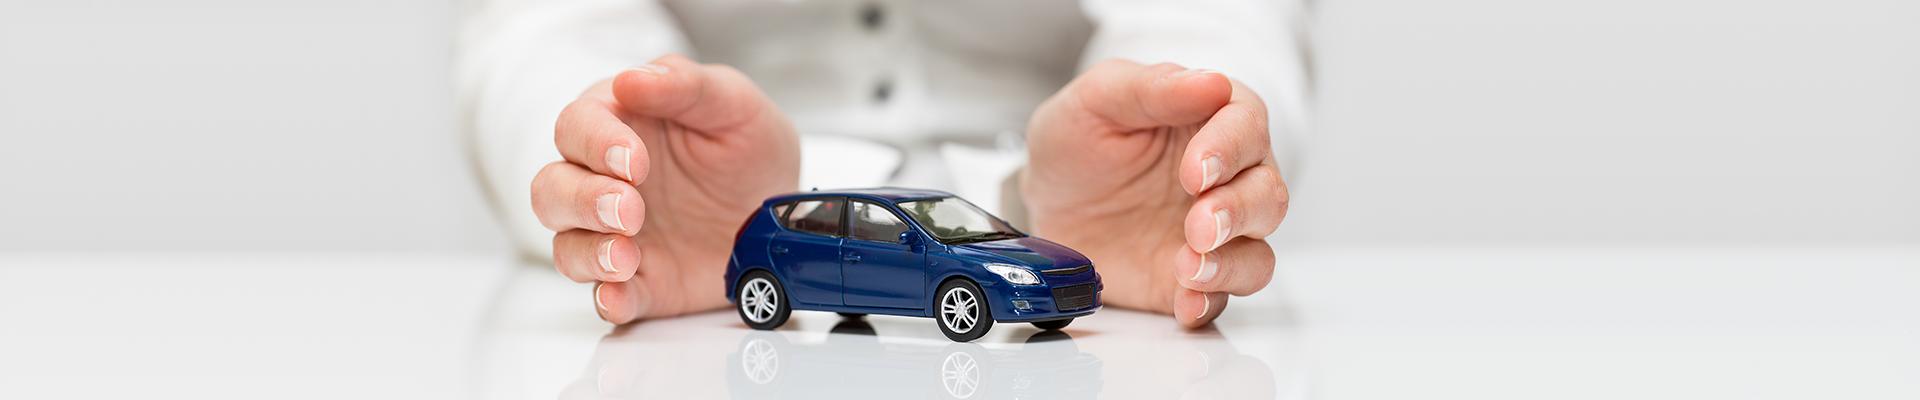 Auto insurance FAQs